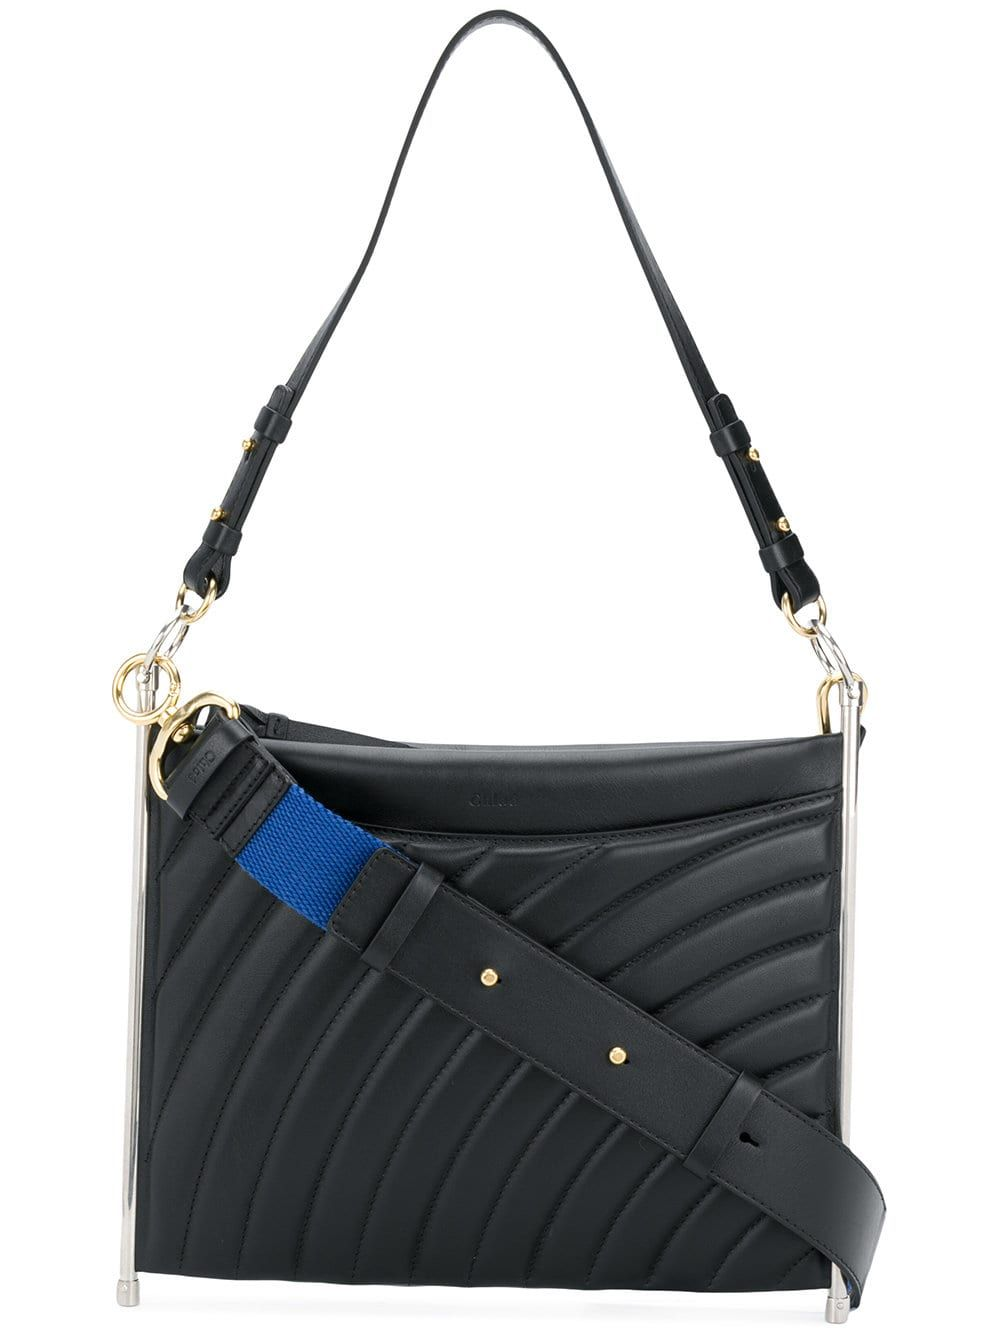 84a64a059332 Designer Handbags, Vintage & Luxury Bags on Sale - Tradesy